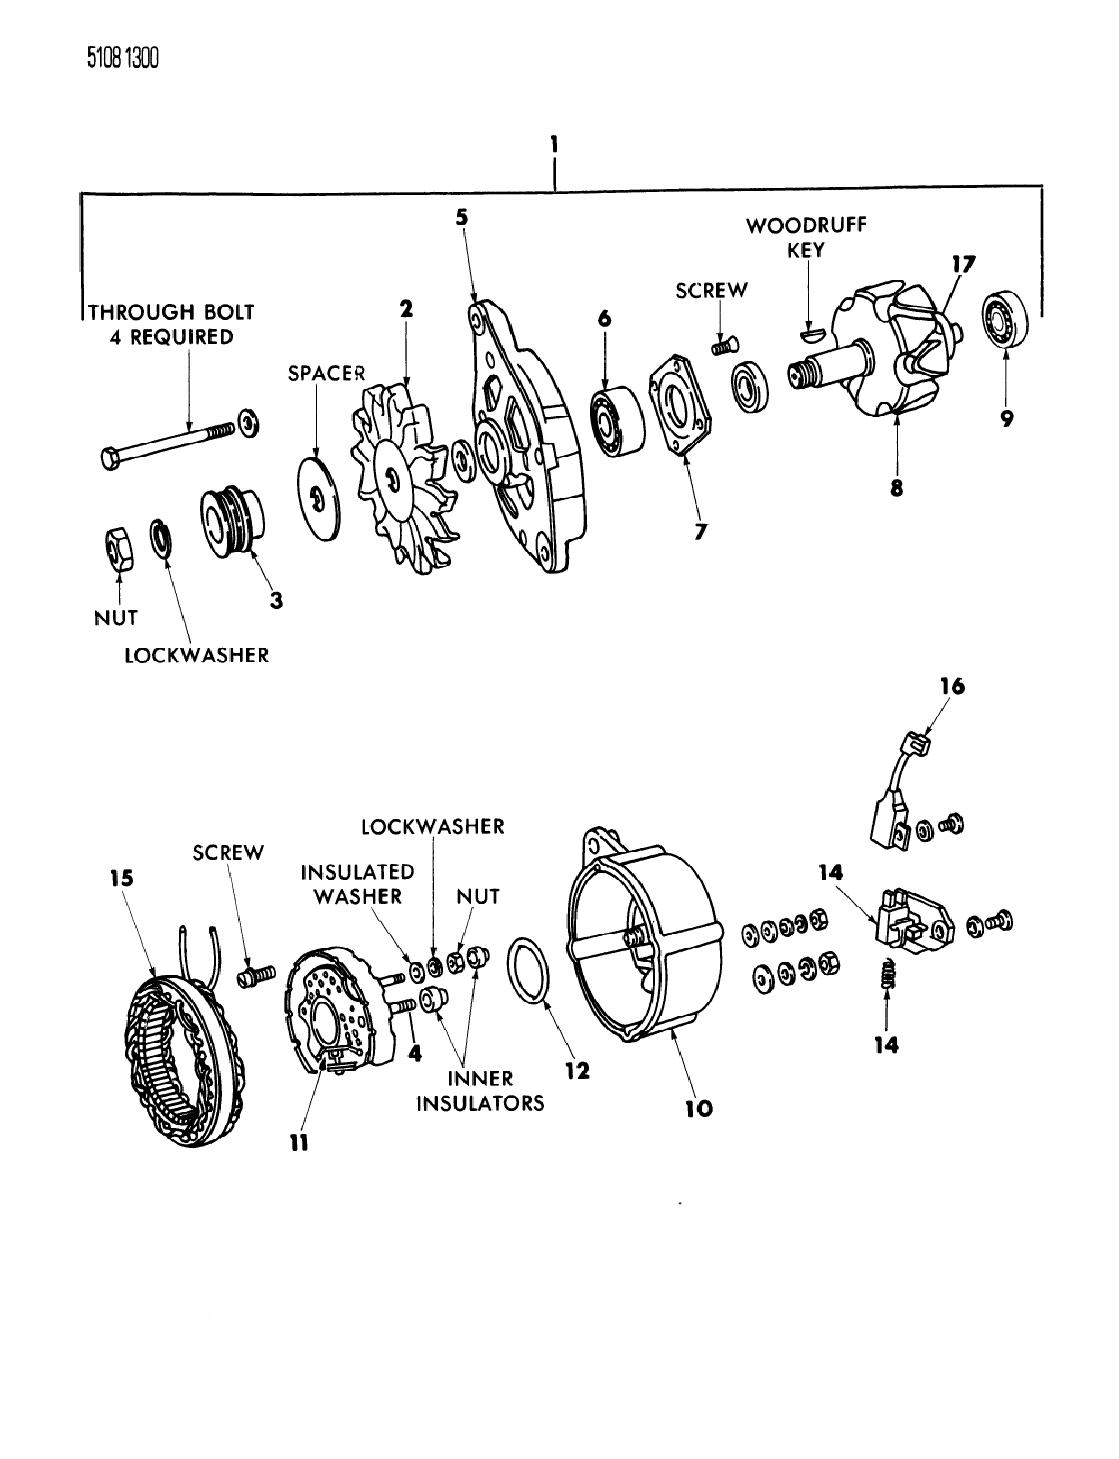 Dodge Omni Wiring Diagram - Wiring Diagrams